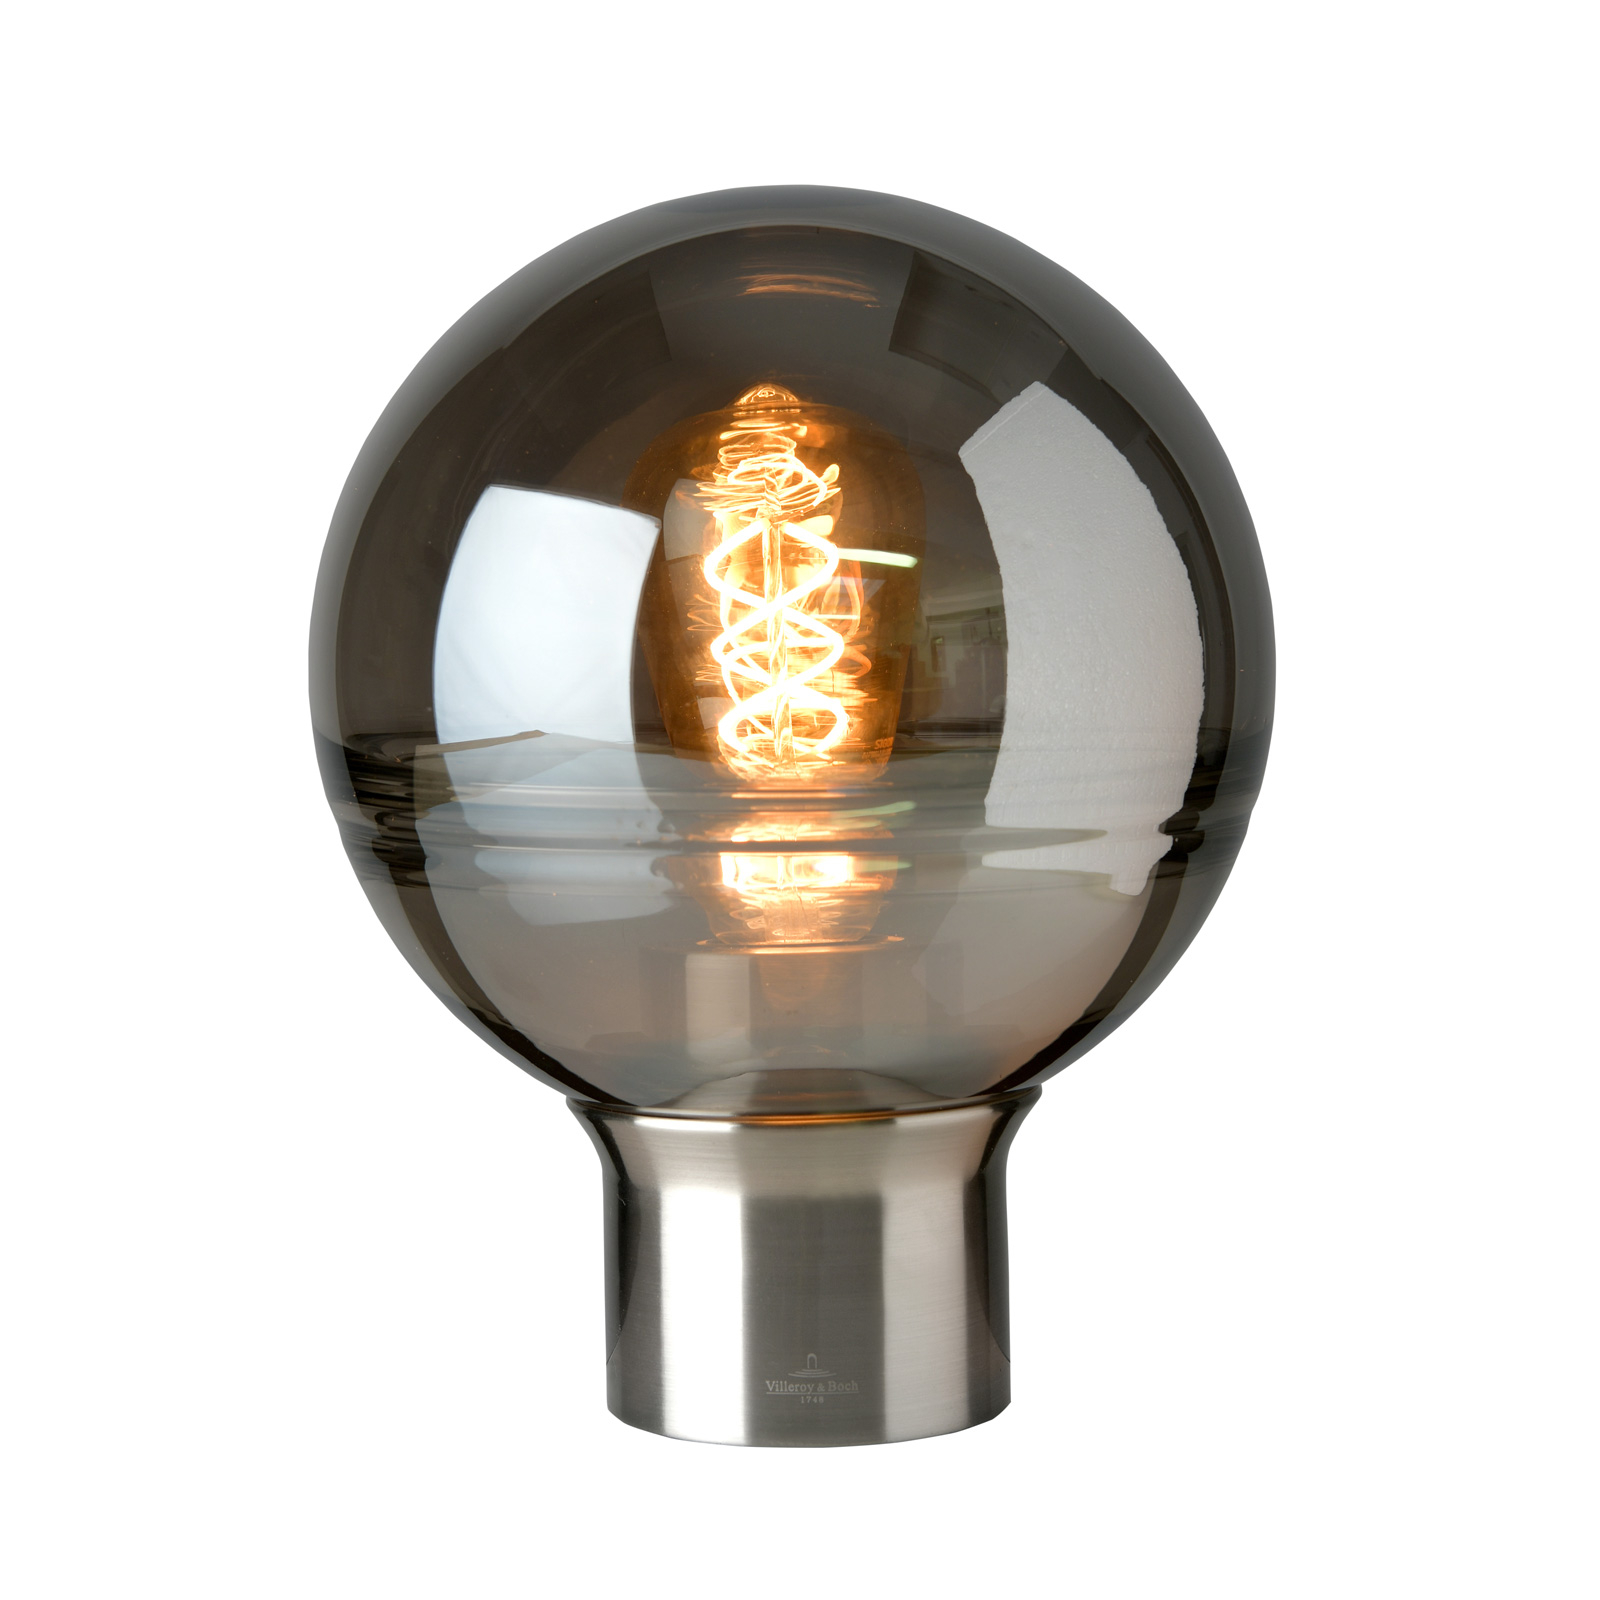 Villeroy & Boch Tokio pöytälamppu, satiini Ø 20 cm